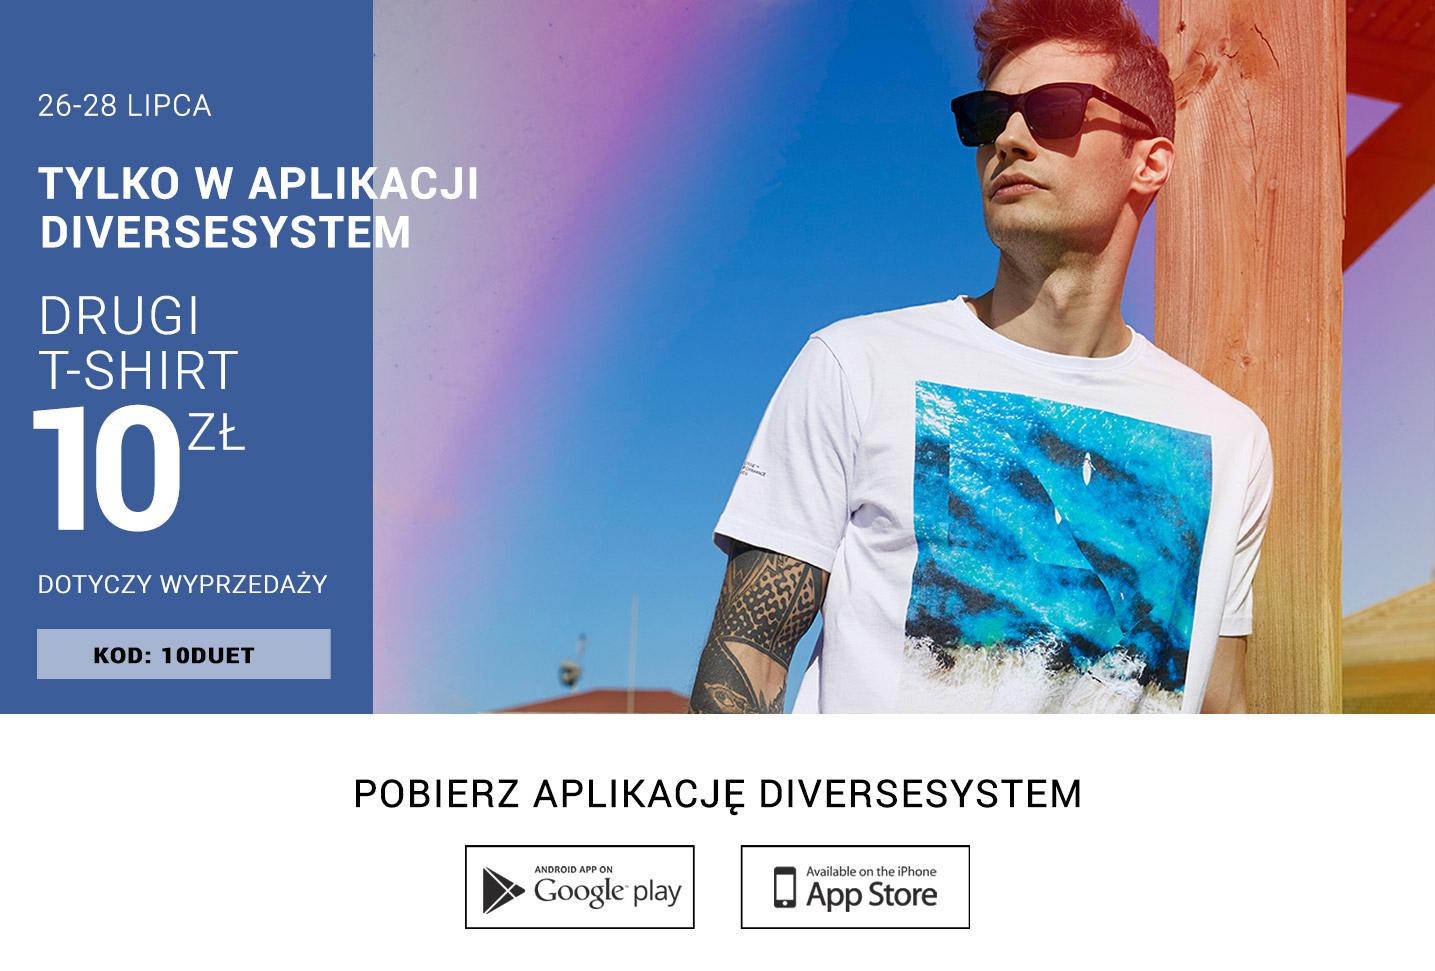 Drugi T-shirt za 10PLN w Aplikacji - Diverse